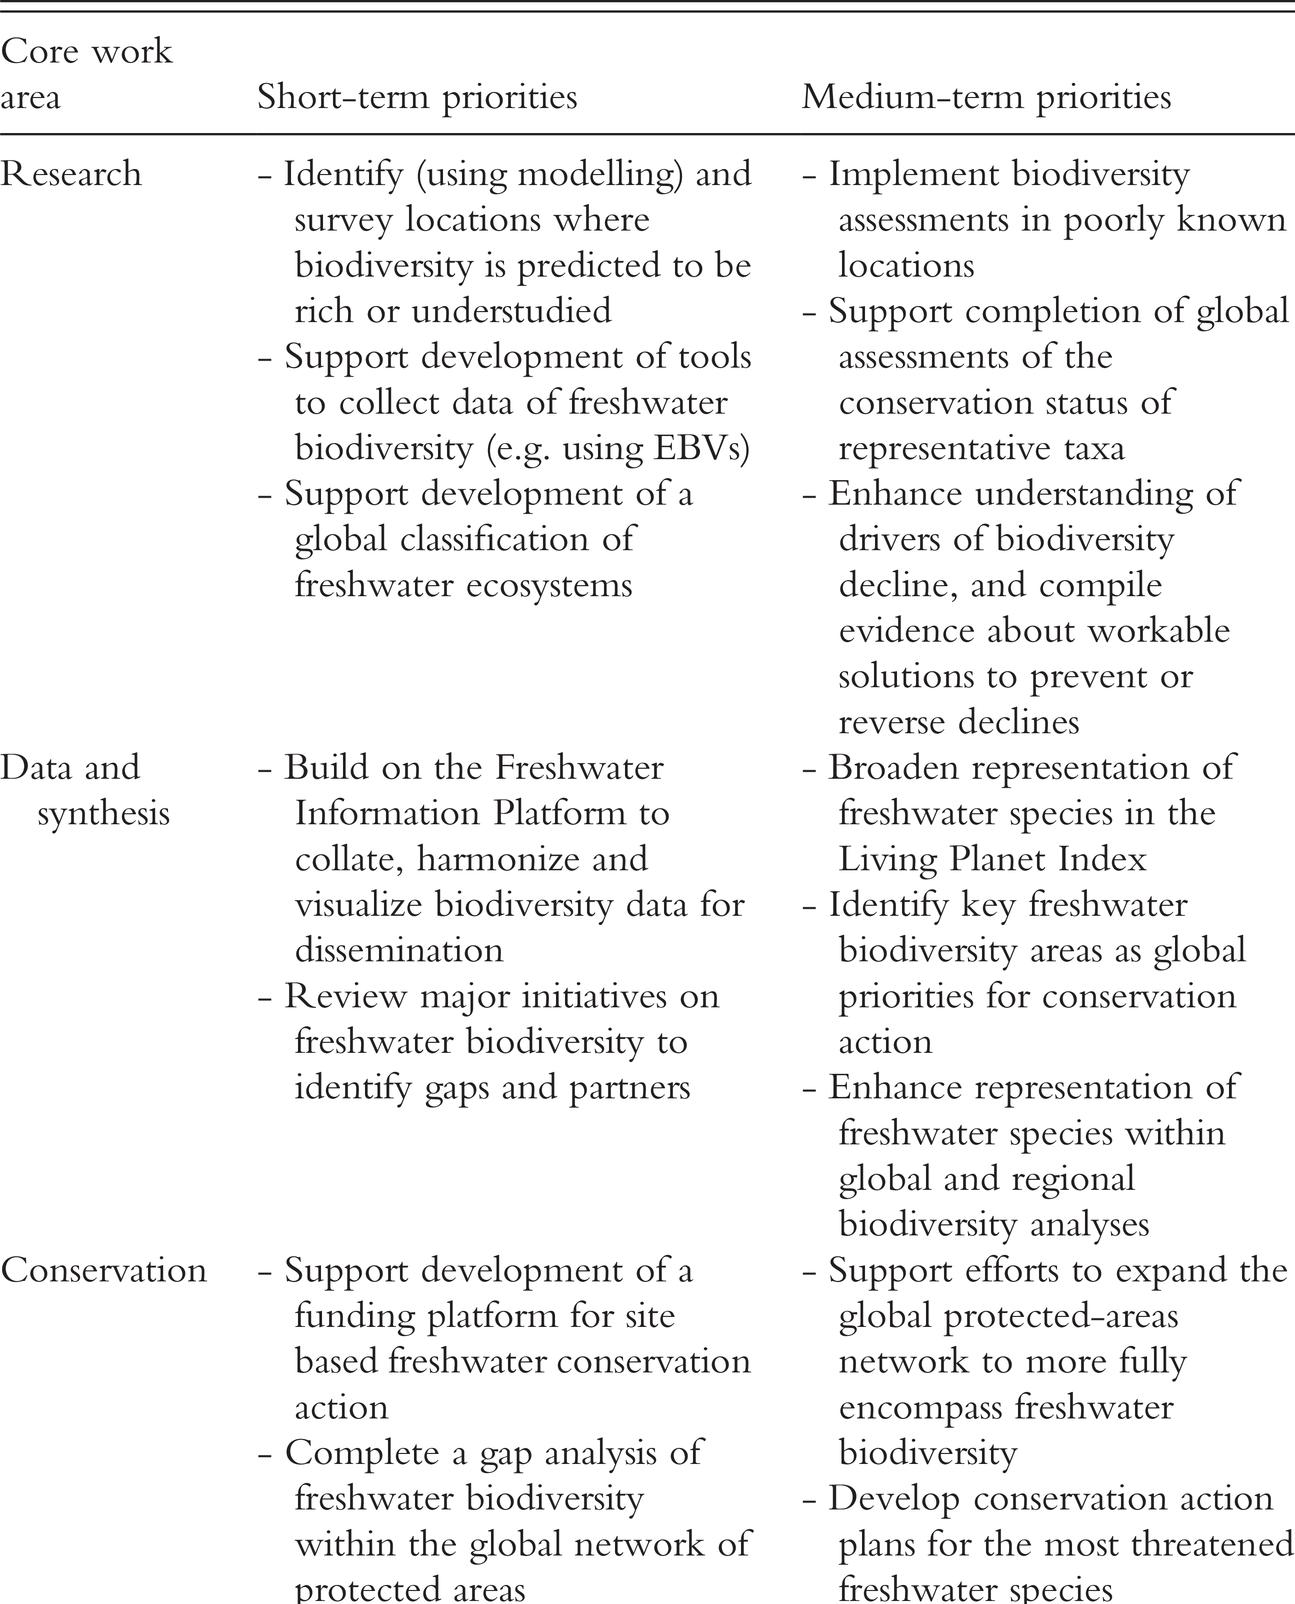 Conservation Of Freshwater Biodiversity Chapter 9 Freshwater Biodiversity